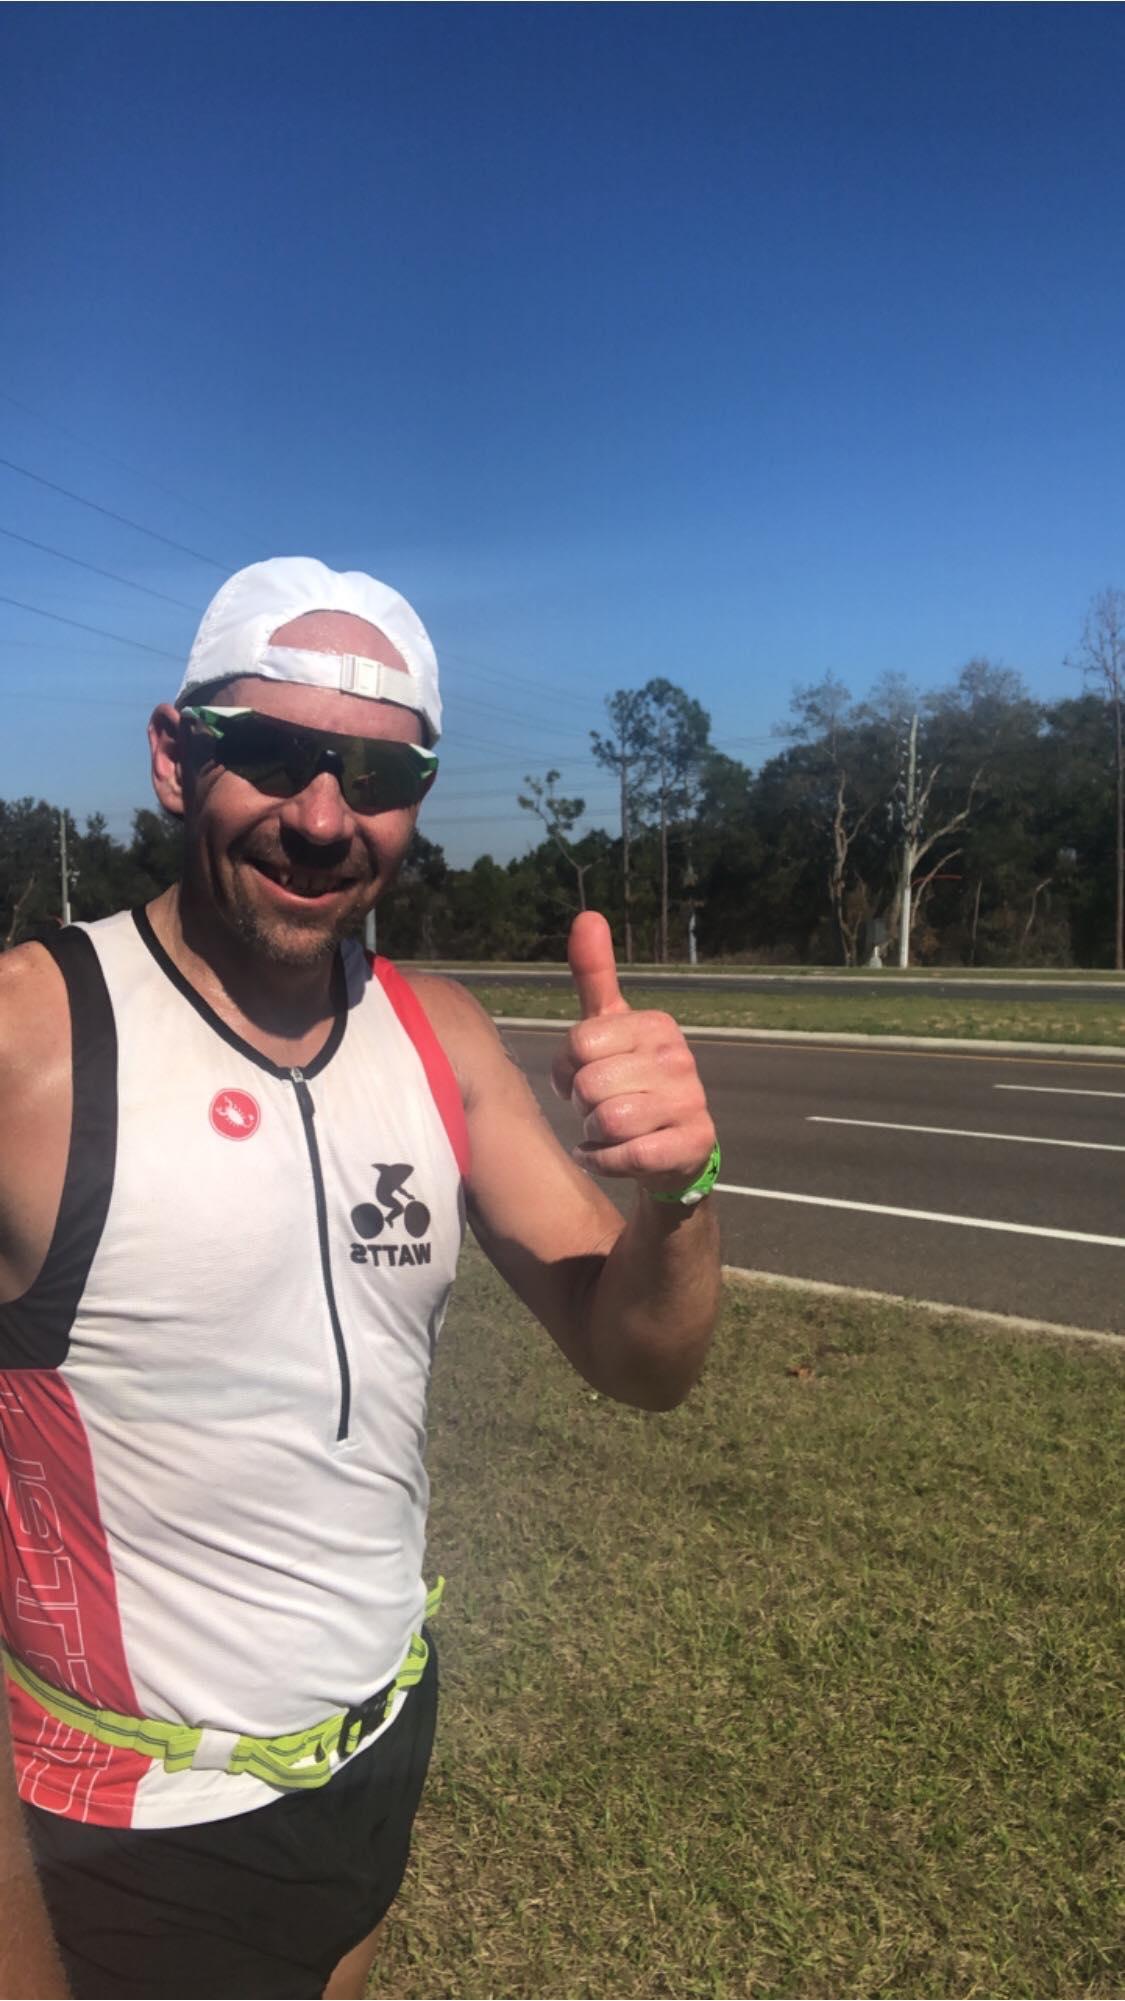 Coach_Terry_Wilson_Pursuit_of_The_Perfect_Race_Ultraman_Florida_Chris_Pollack_Run.jpg